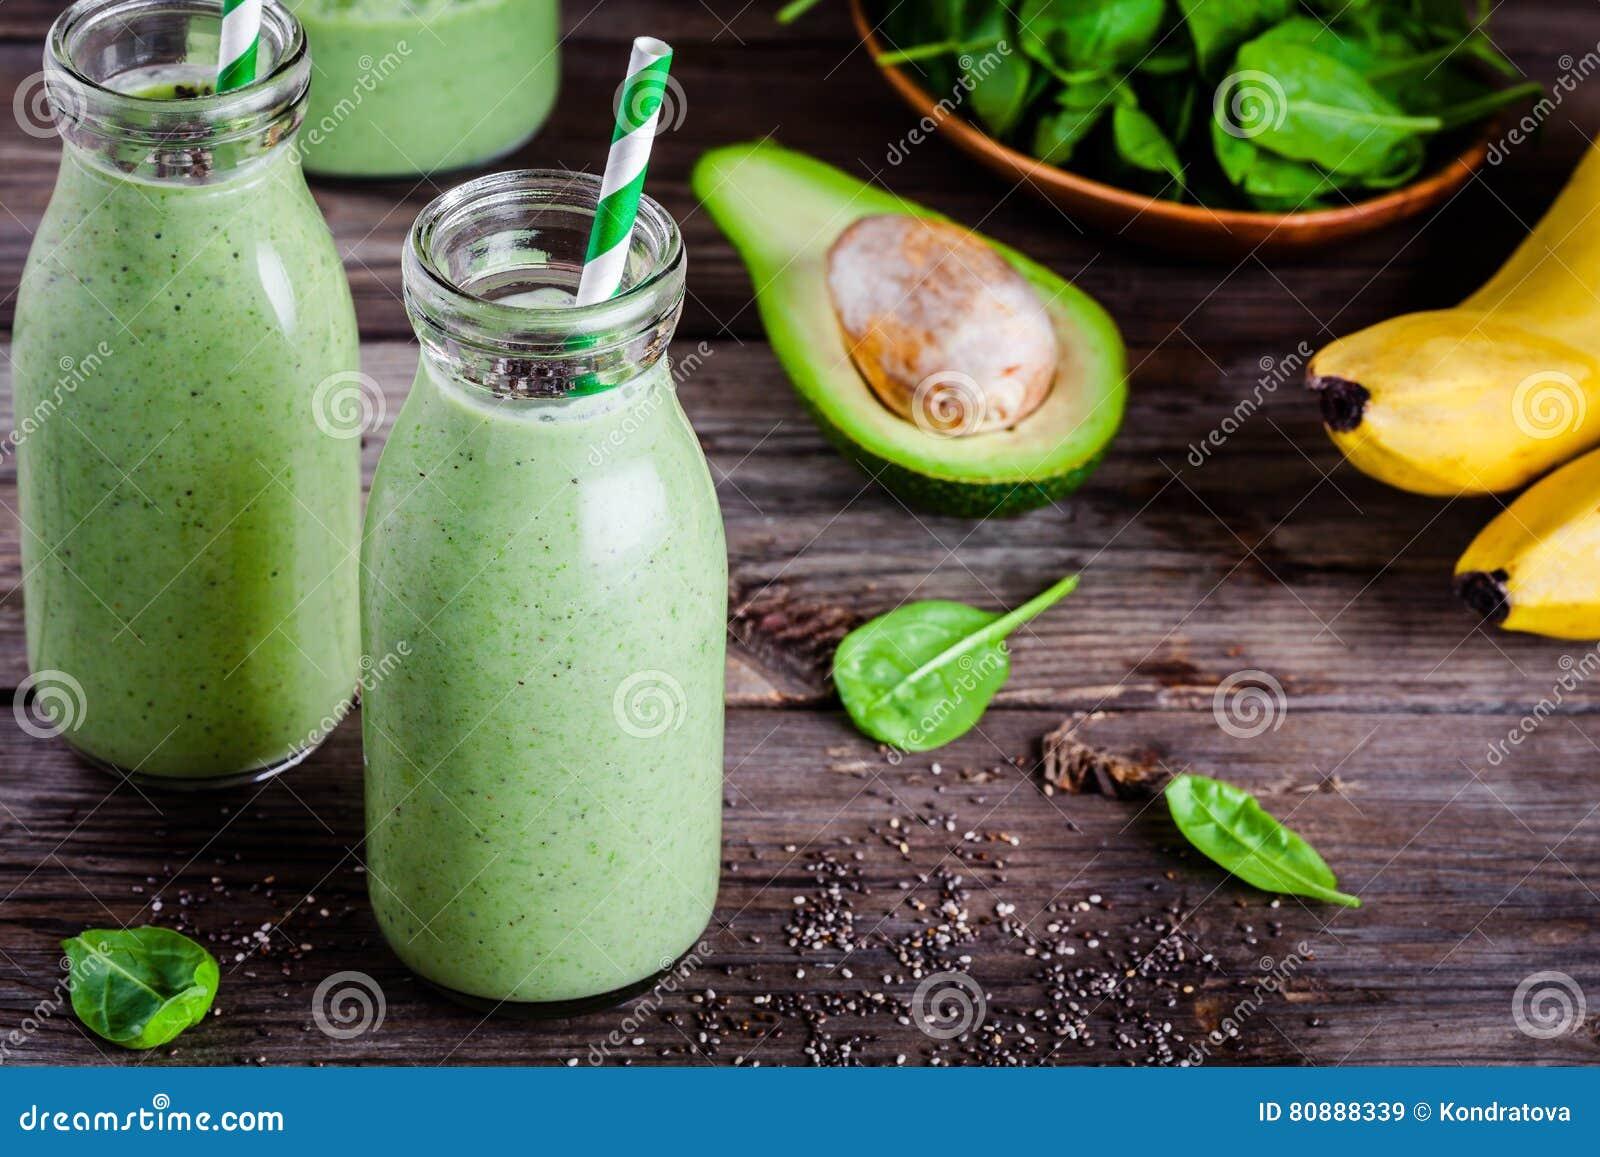 grön smoothie spenat avokado